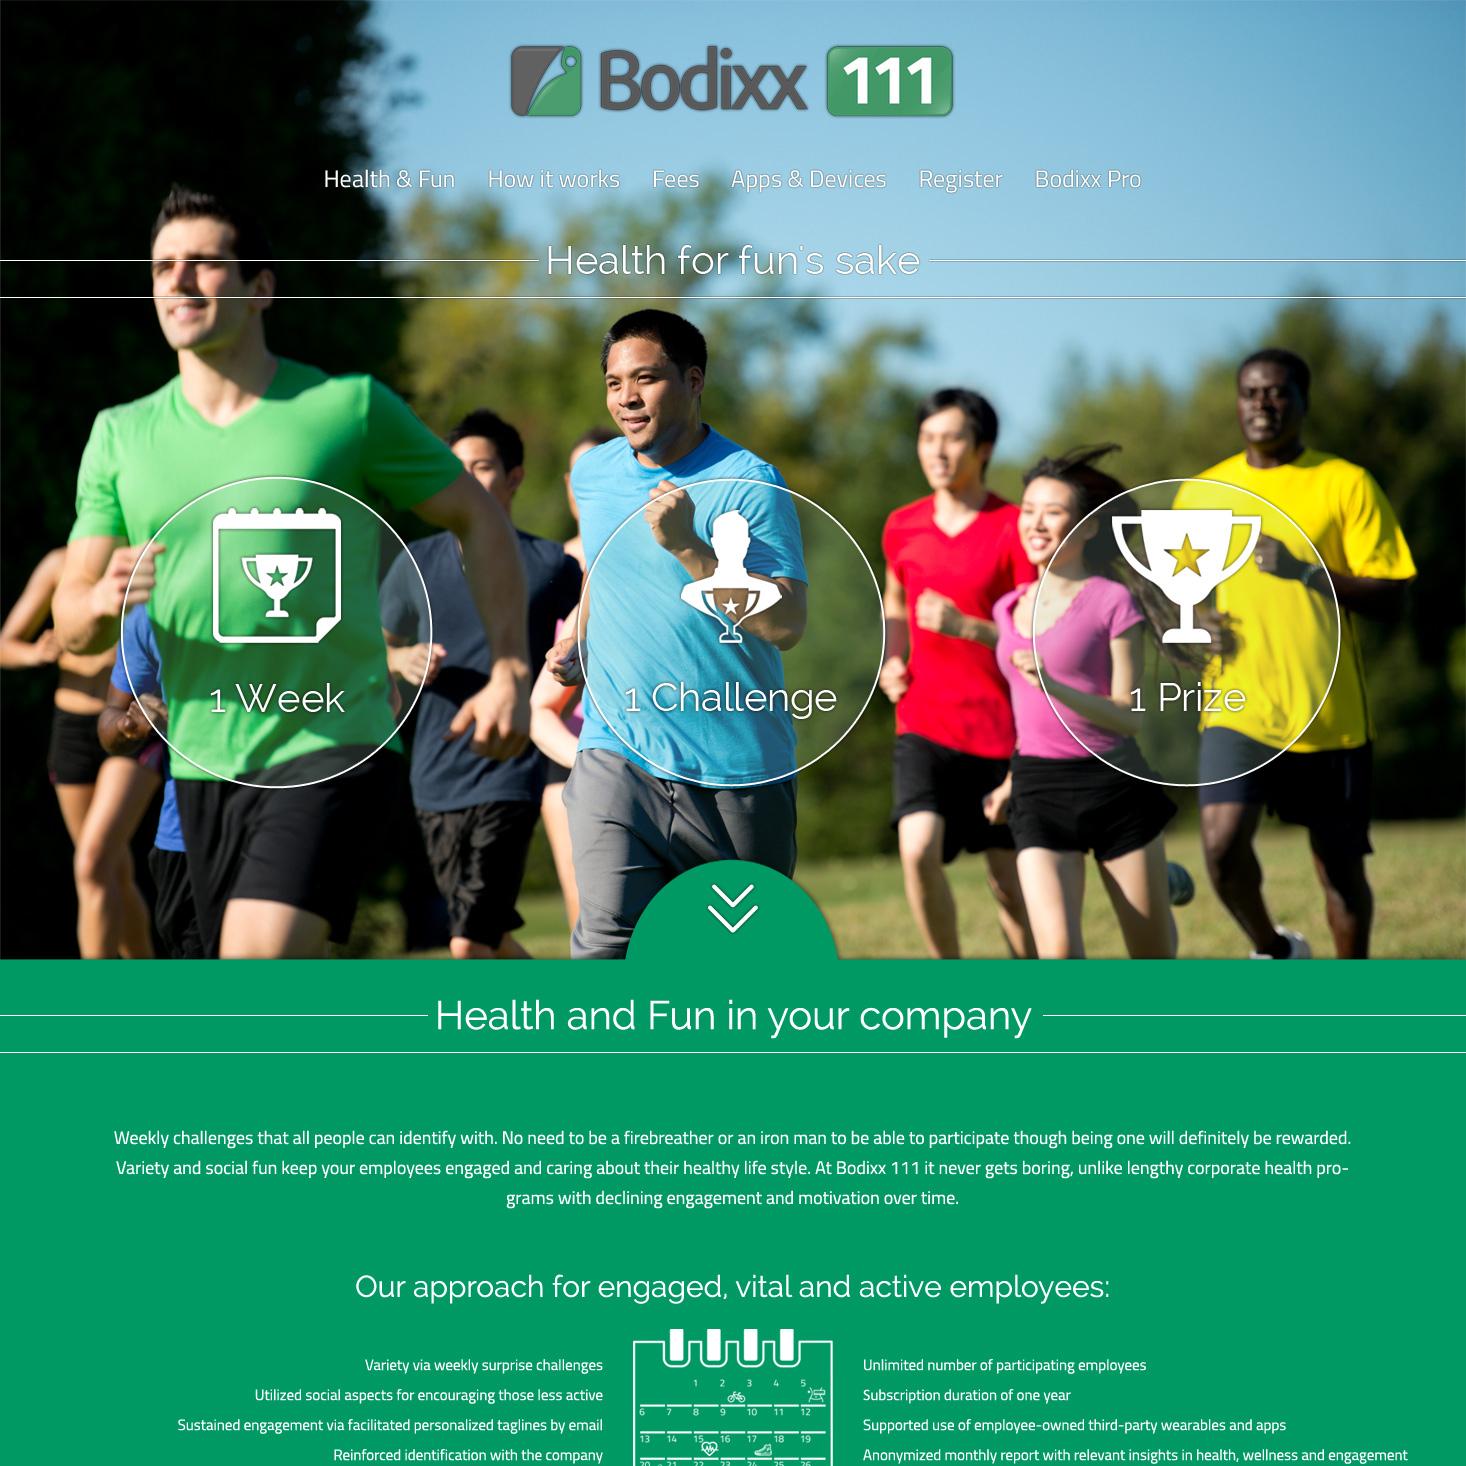 bodixx111 one page website design